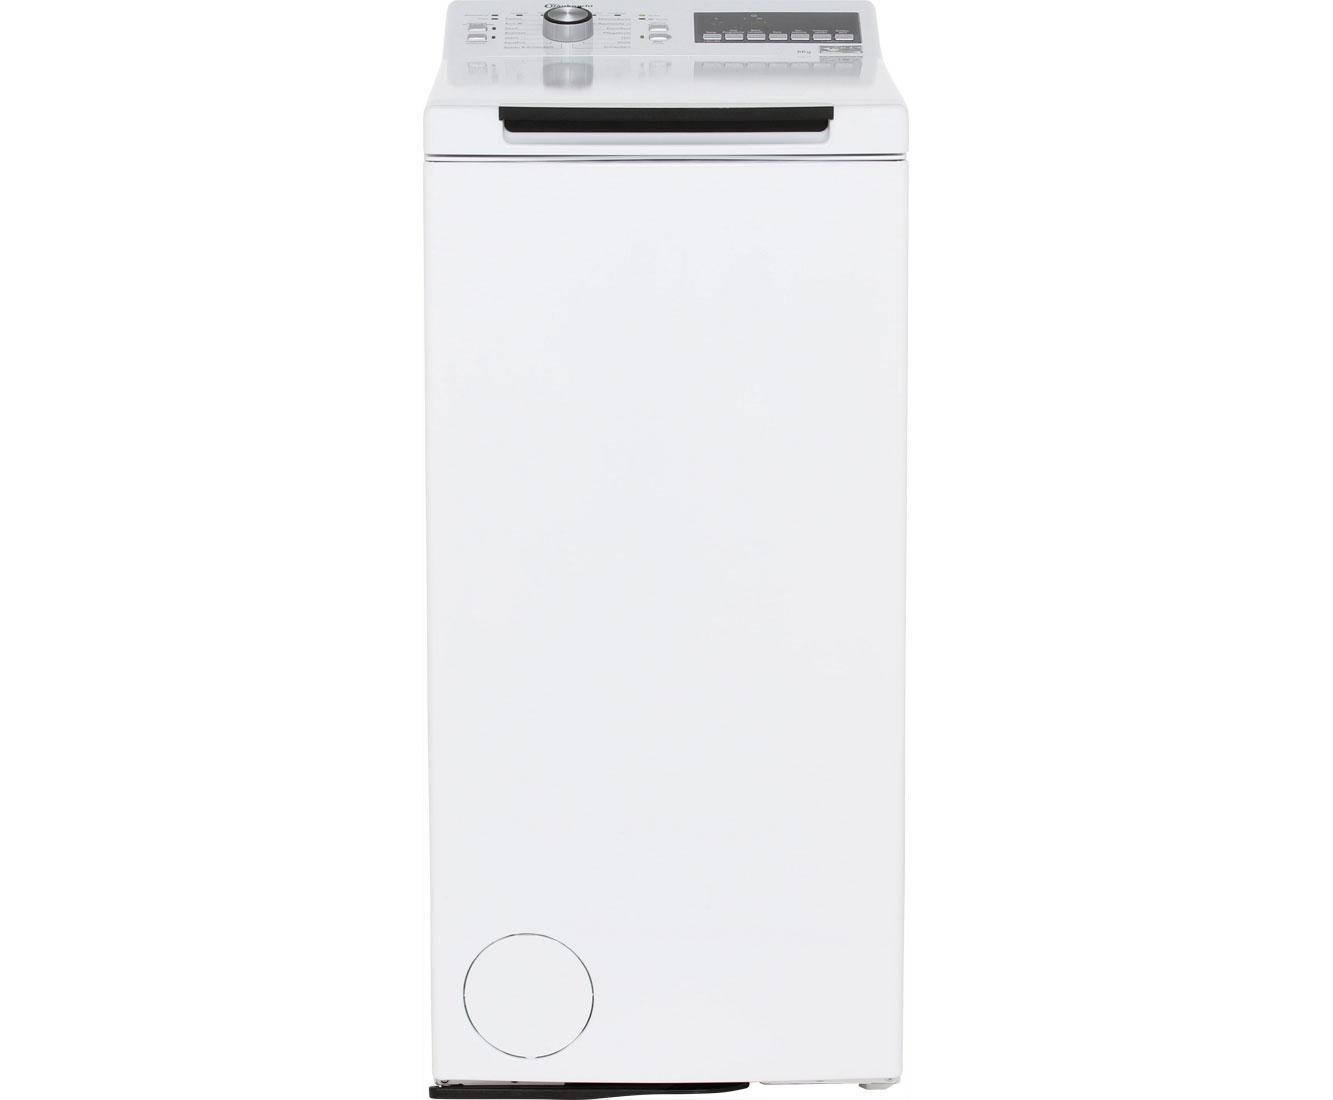 Bauknecht WAT Prime 652 Z Waschmaschine Toplader, 6 Kg, 1200 U/Min, A+++